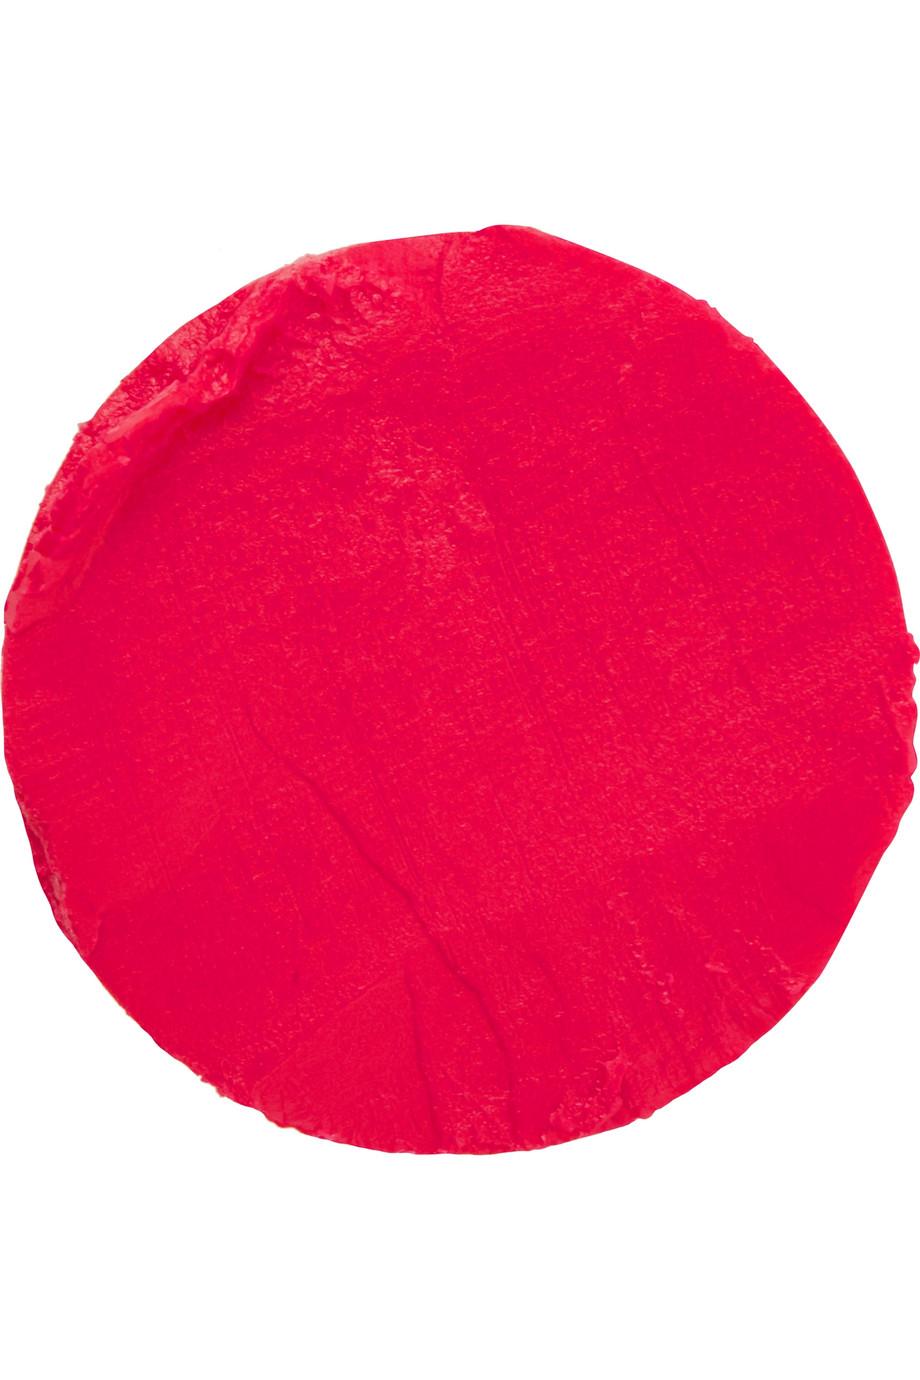 Chantecaille Lip Veil - Oleander